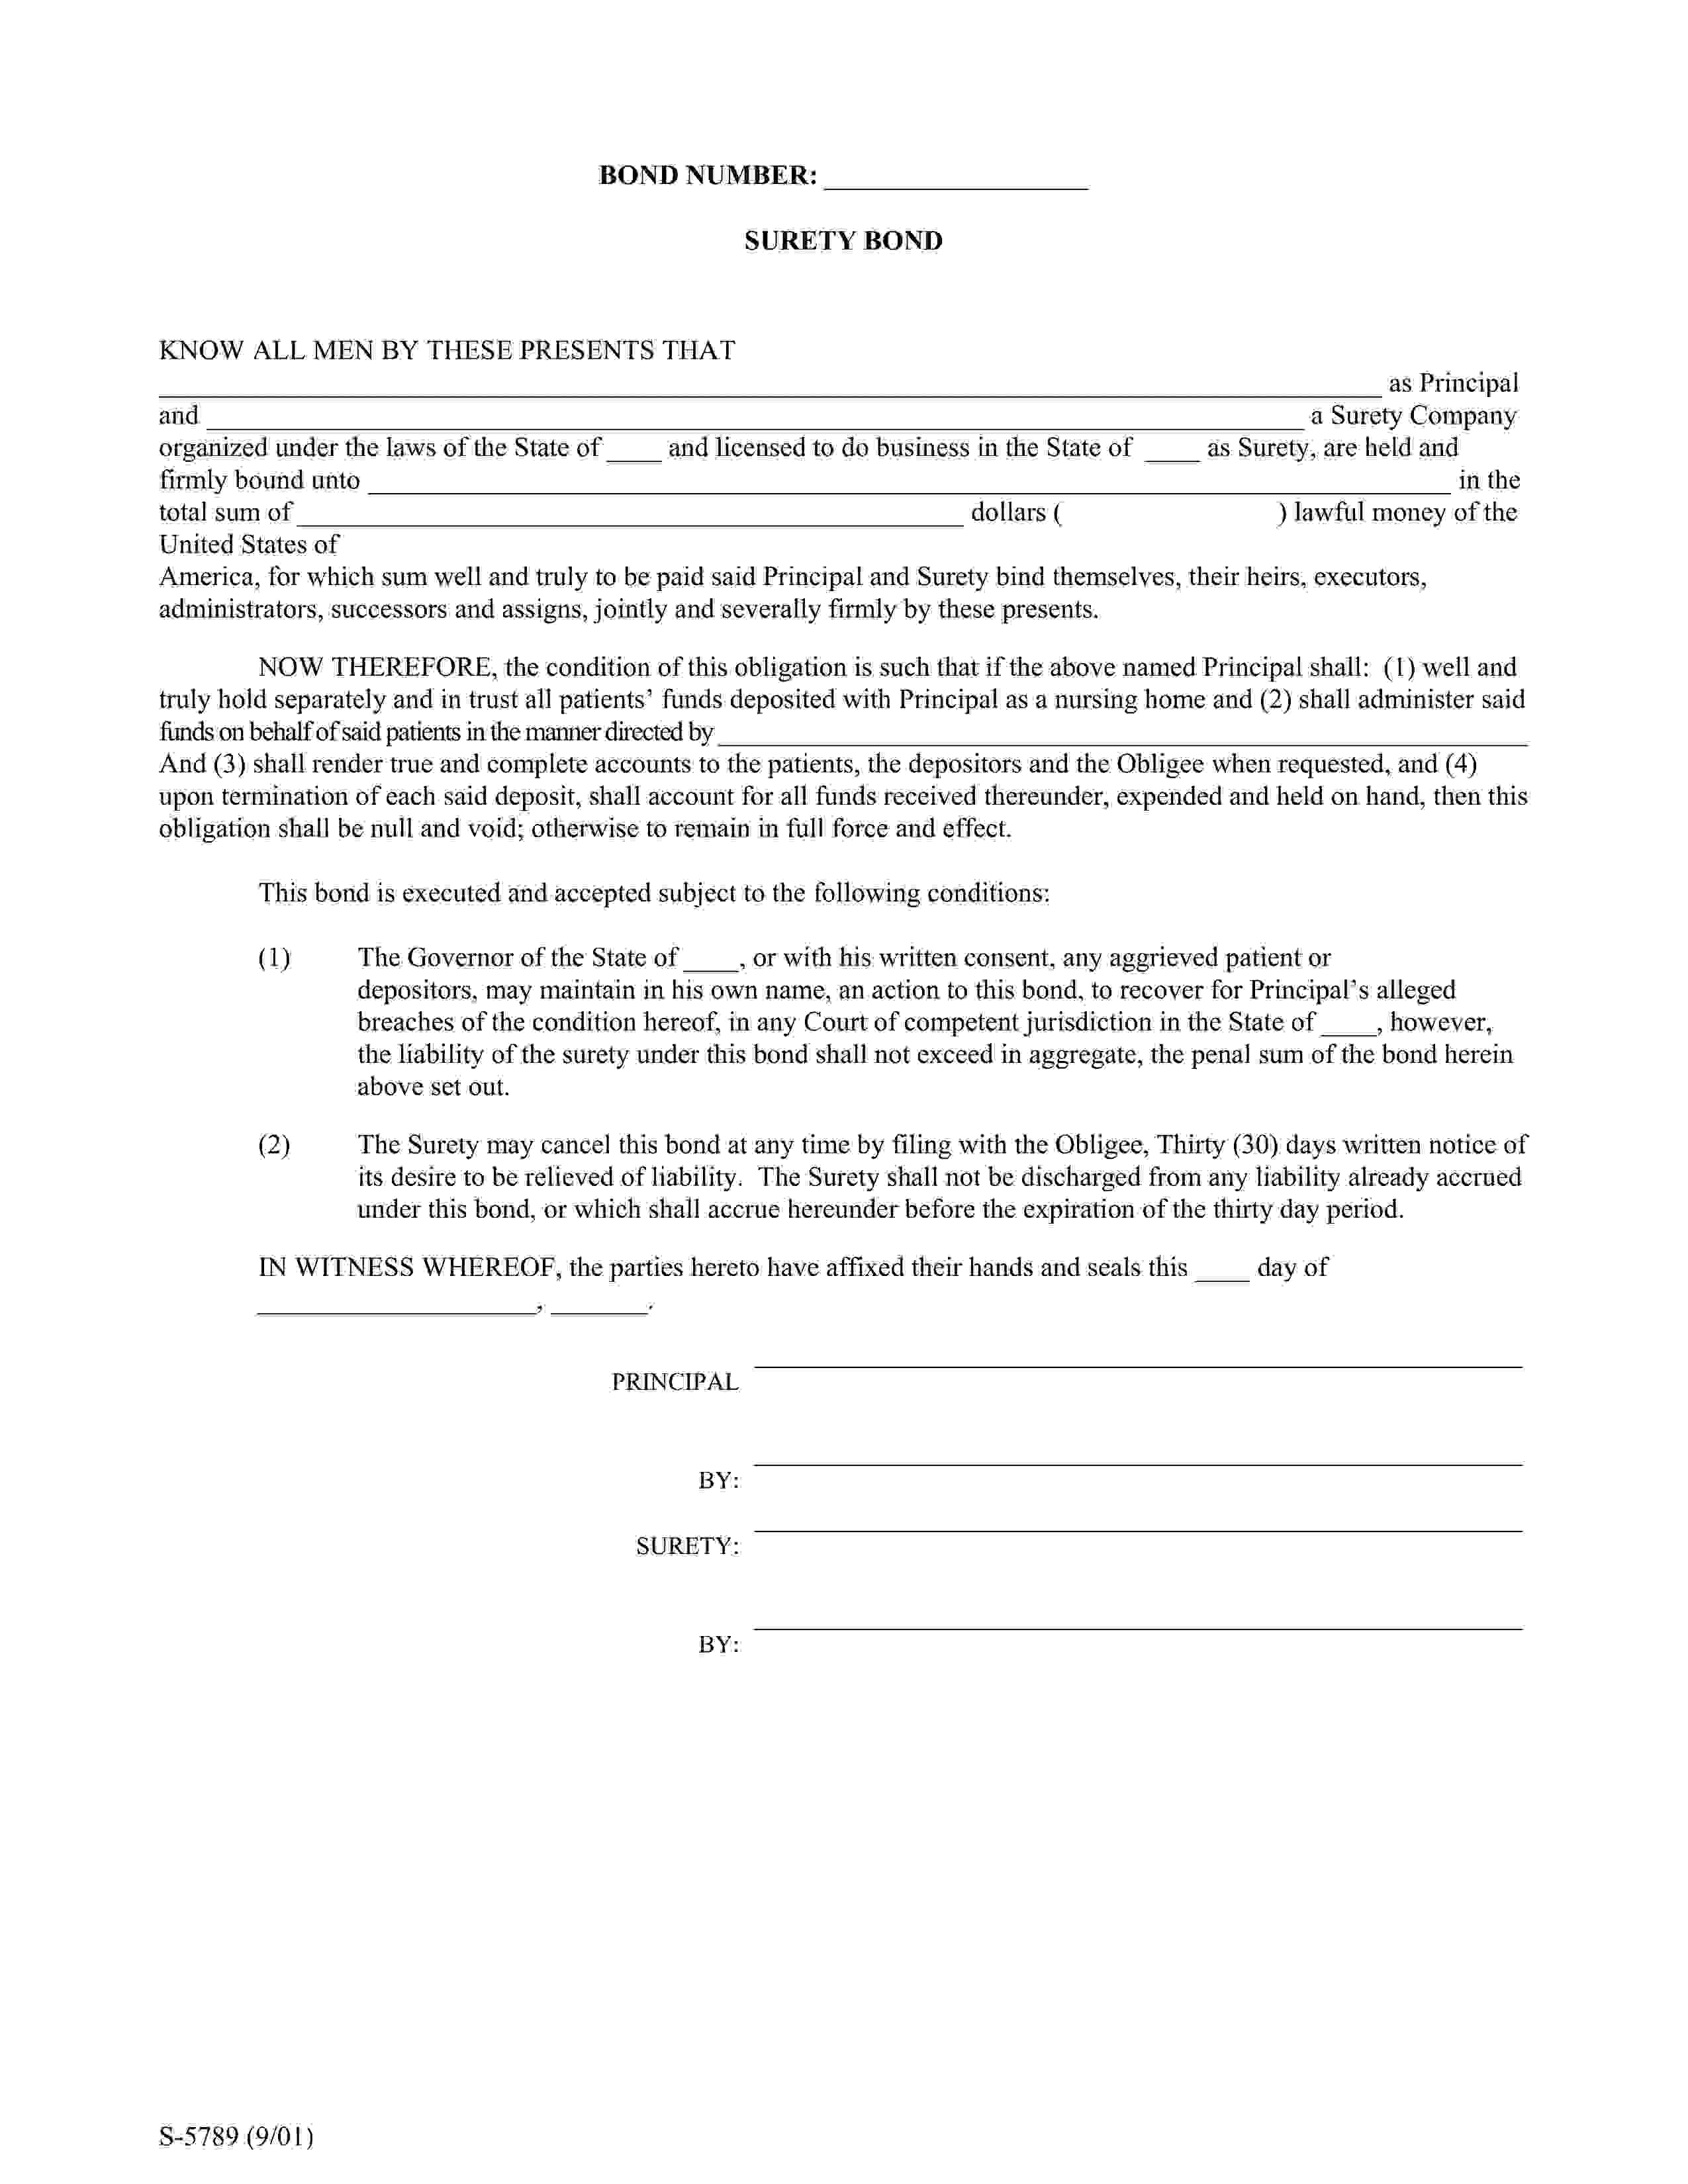 Maryland Department of Health Nursing Home Patient Trust Funds Bond sample image